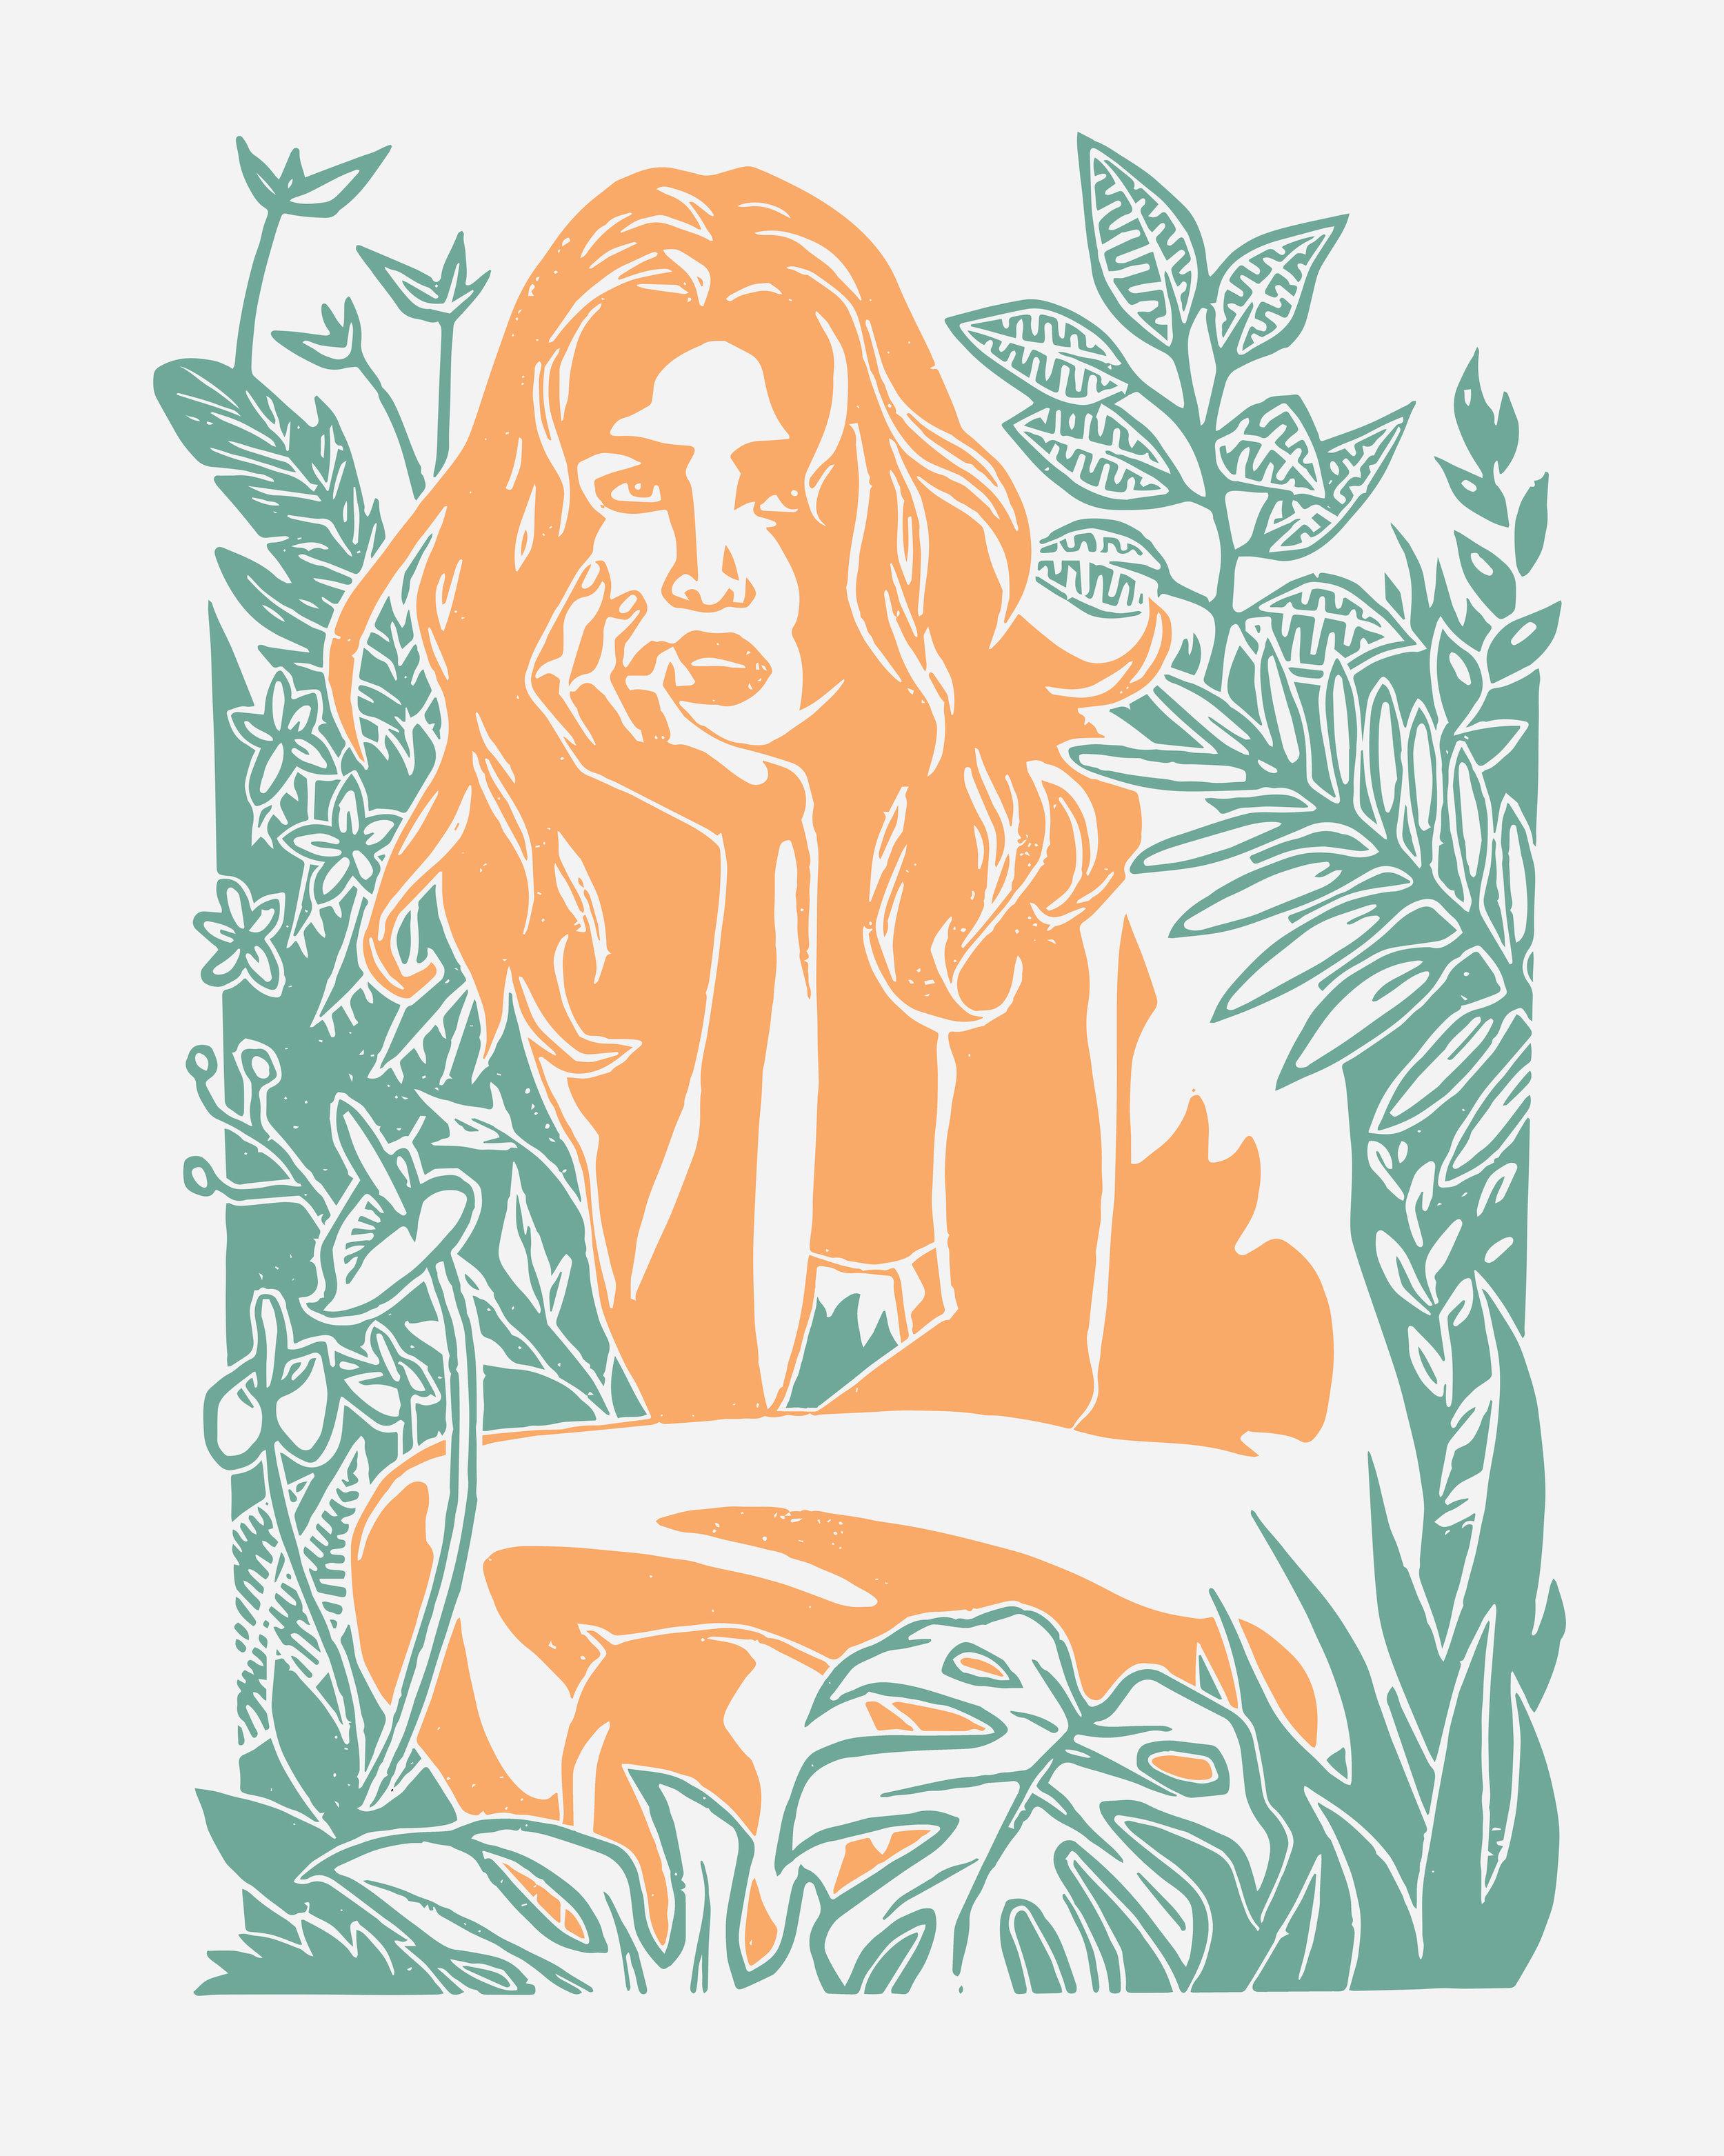 Jungle 2 web.jpg